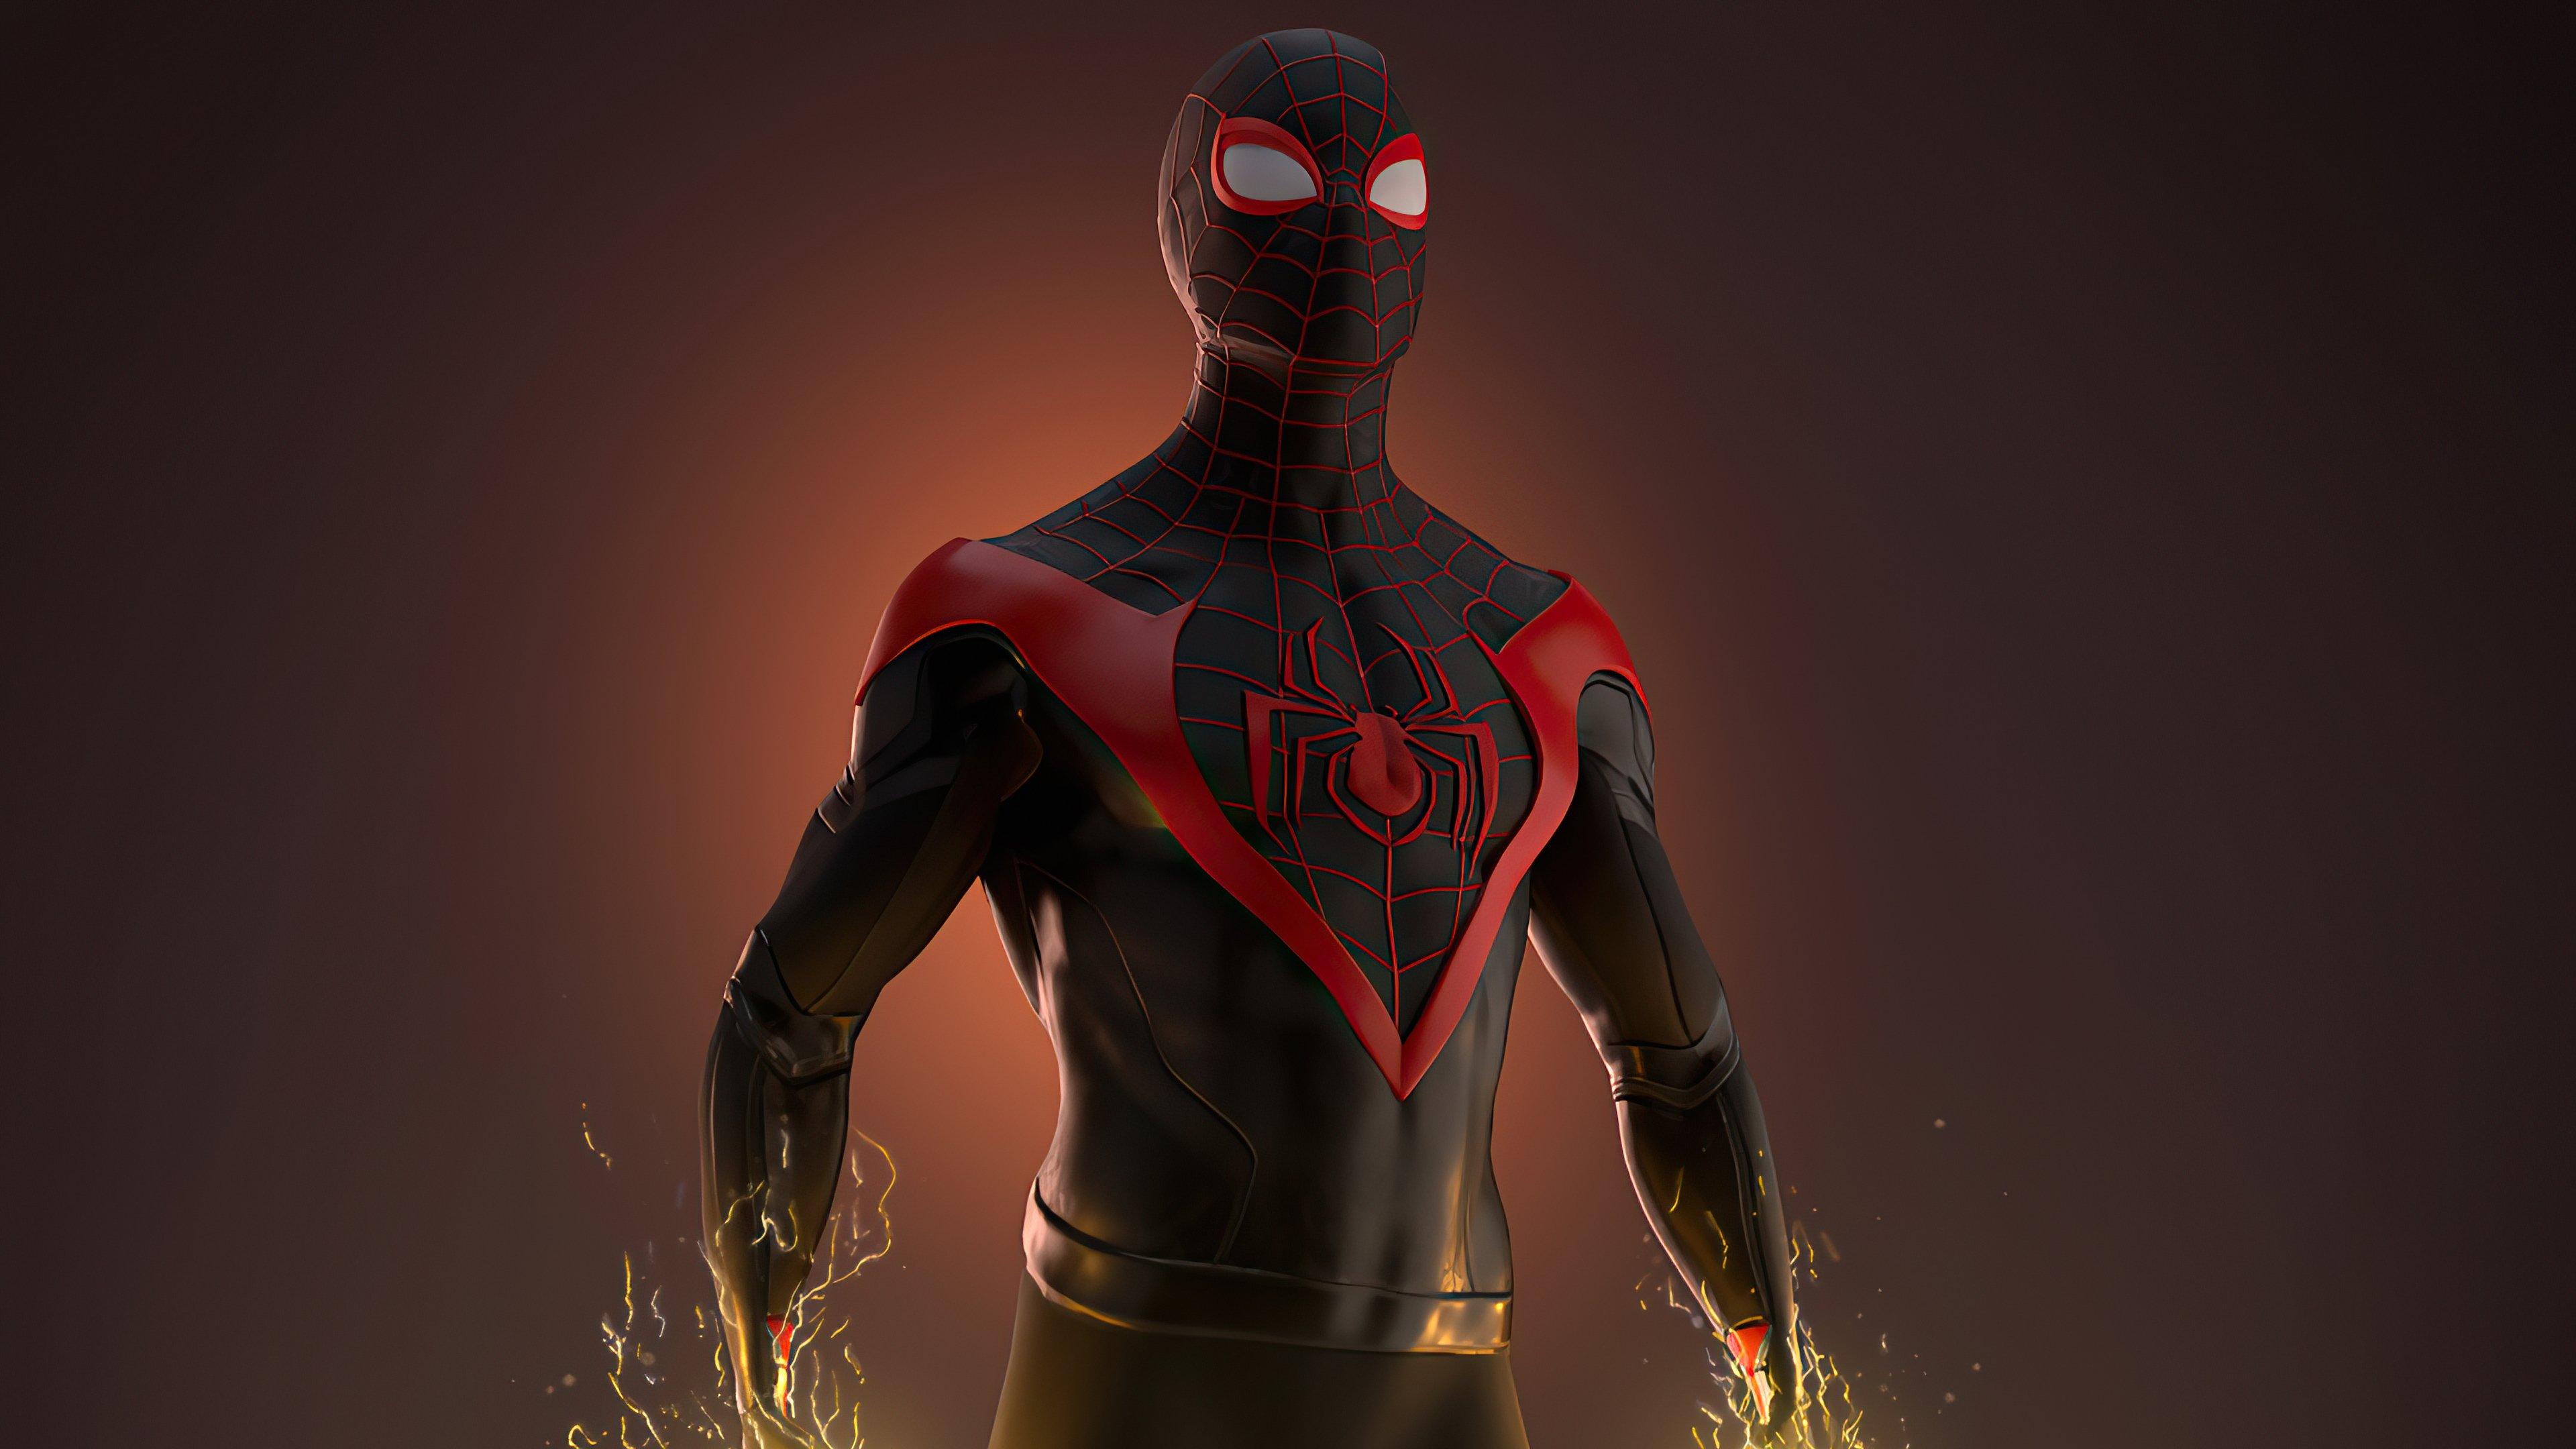 Wallpaper Miles Morales as Spiderman 2020